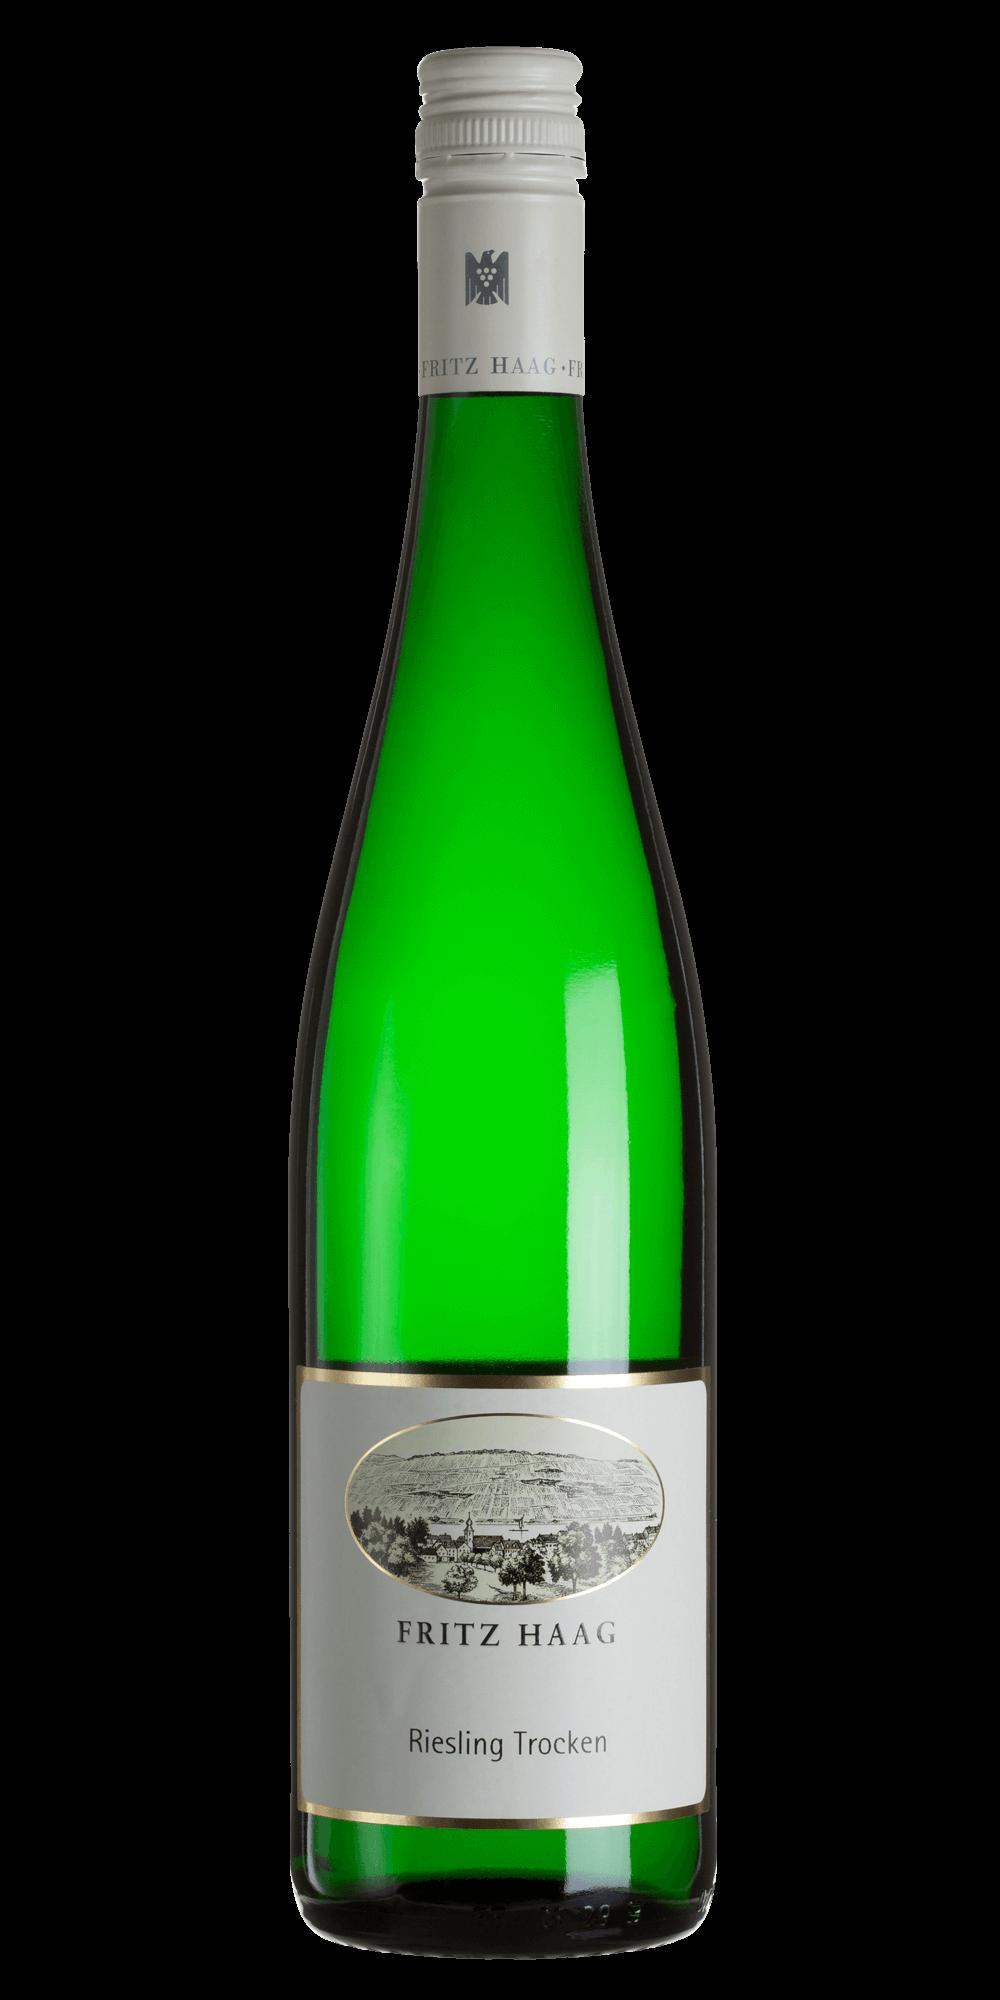 Weingut Fritz Haag Riesling Trocken 75cl